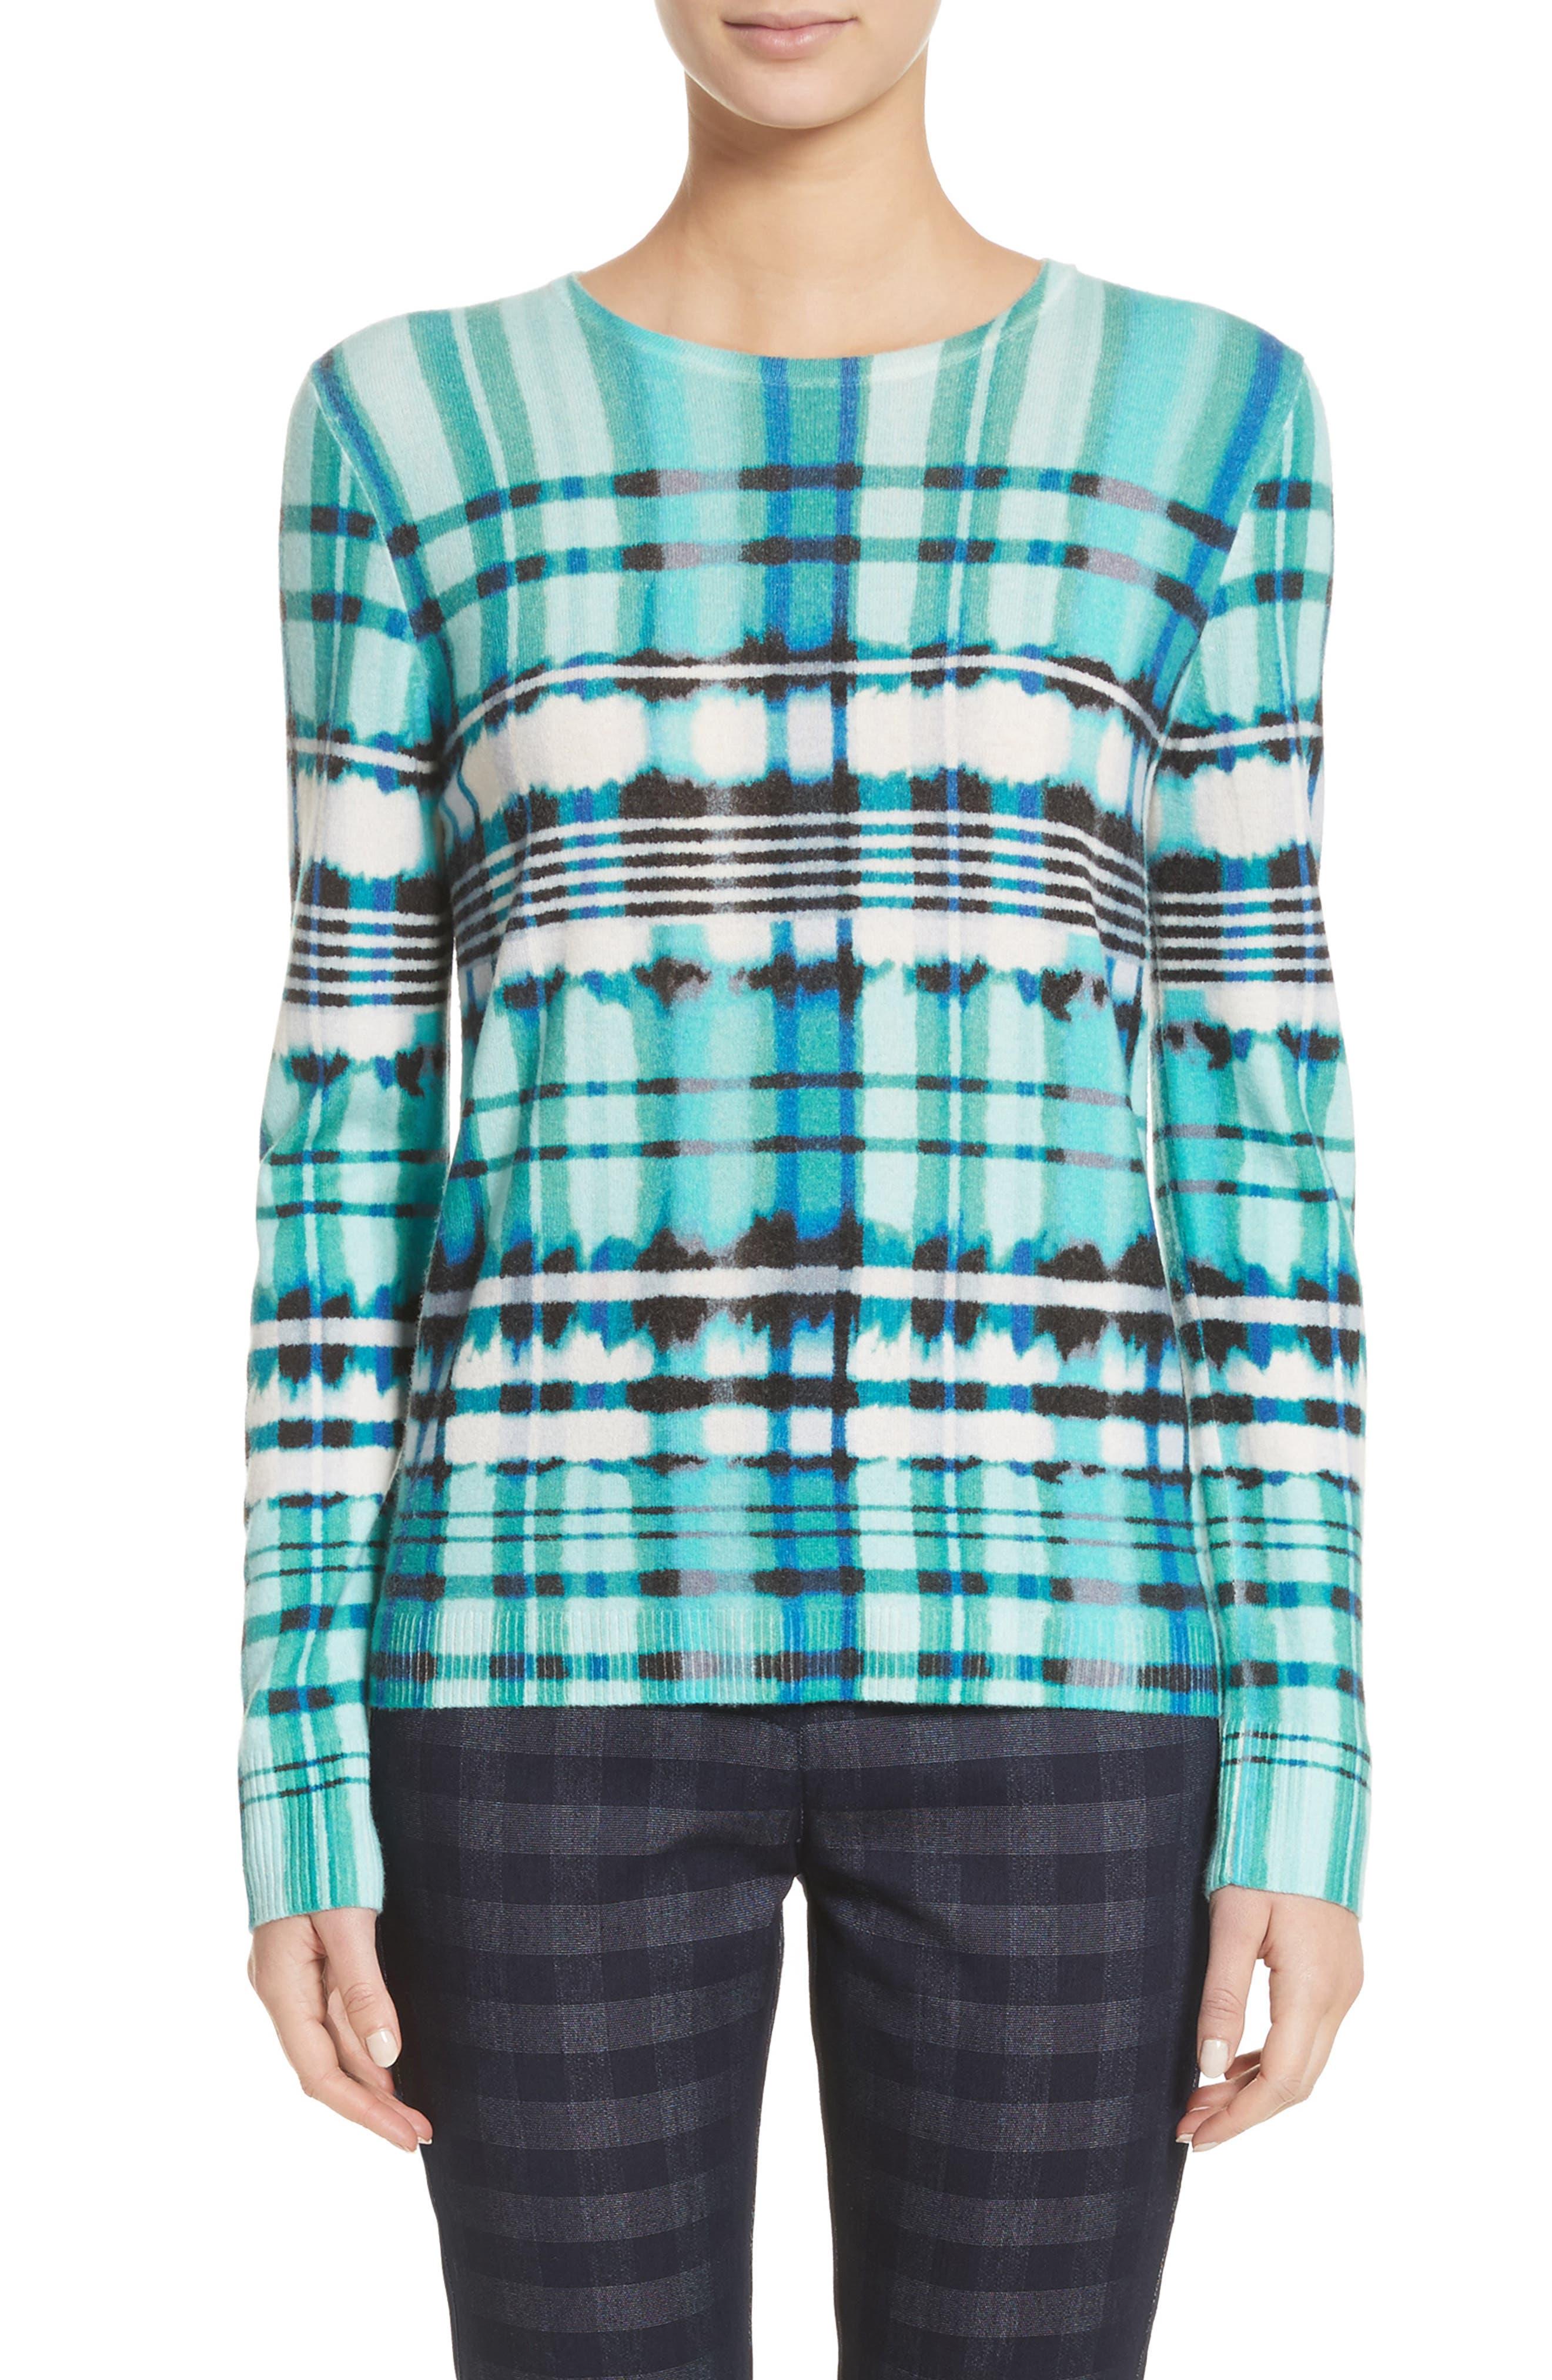 Overprint Plaid Cashmere Sweater,                             Main thumbnail 1, color,                             350